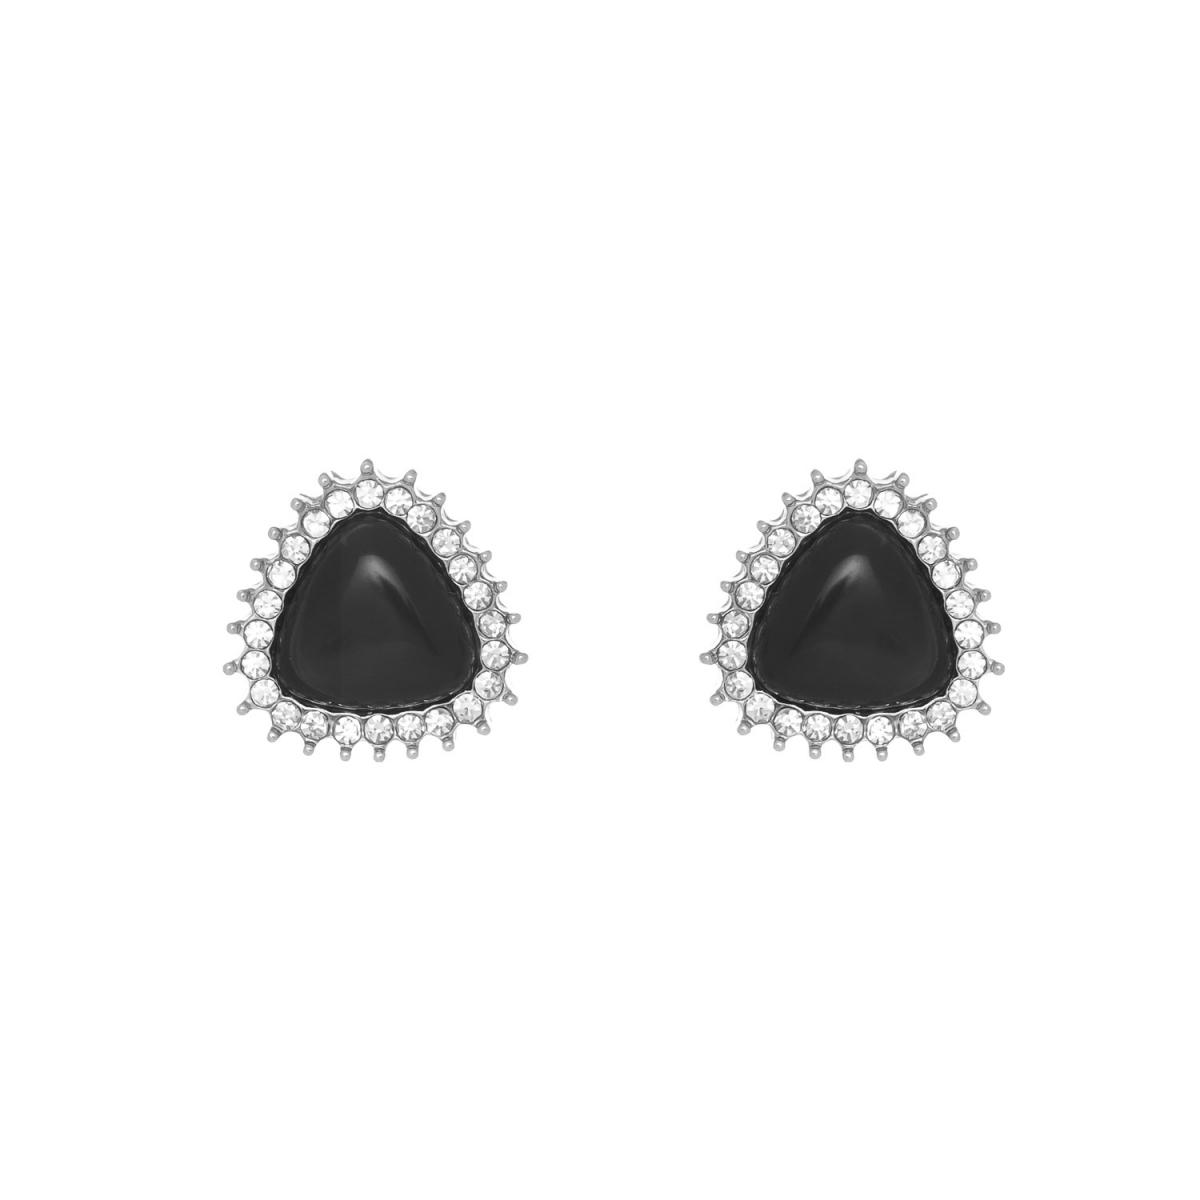 Náušnice Black Triangle Silver